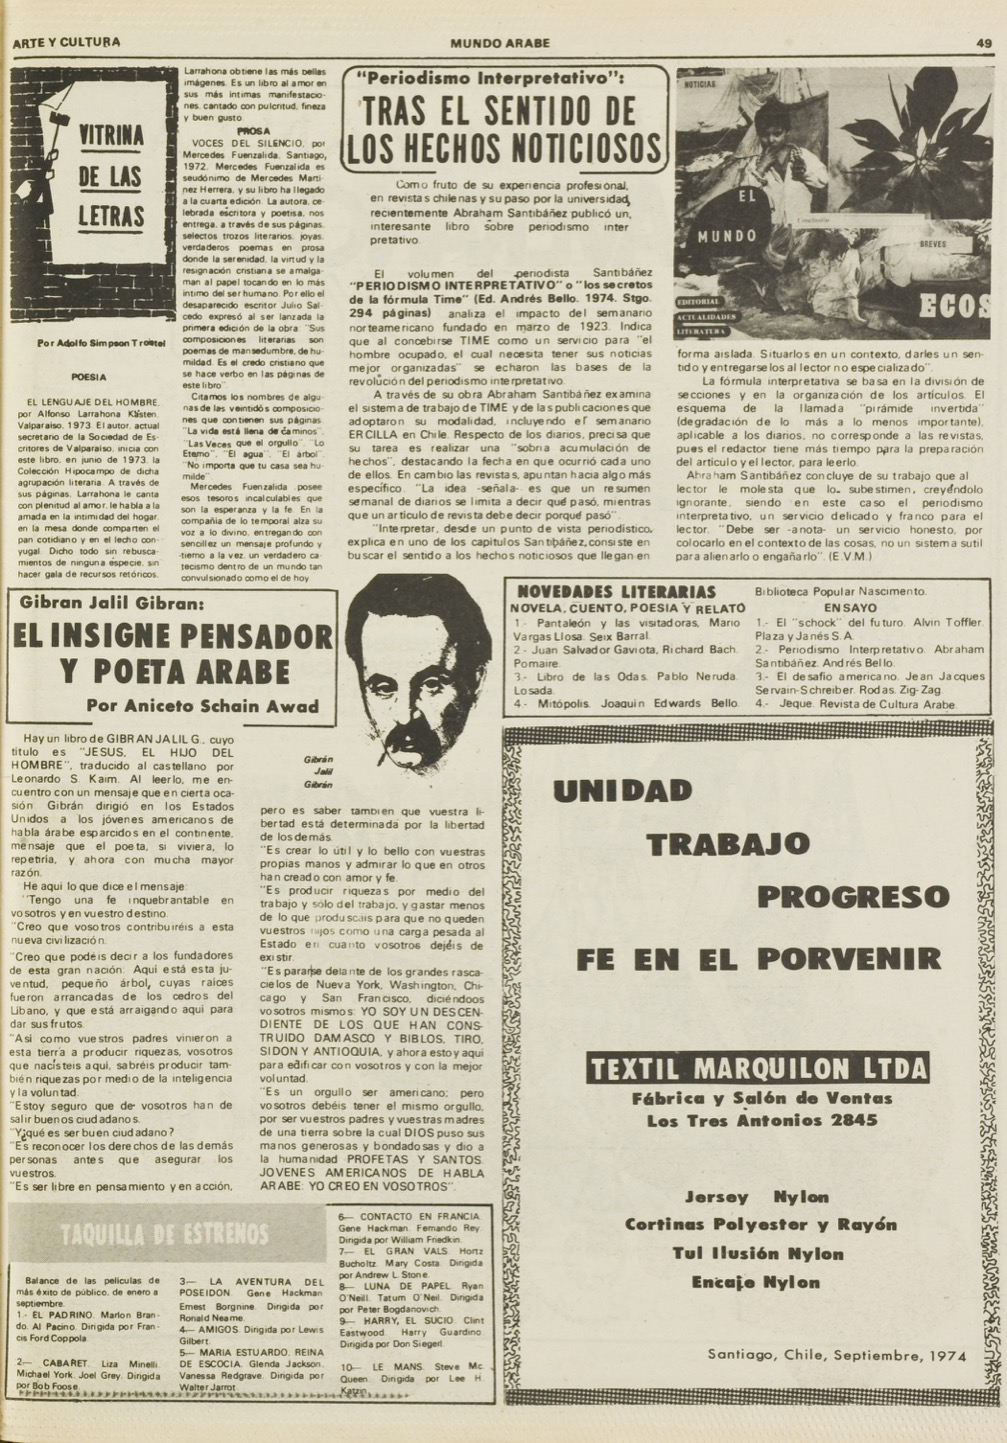 "Aniceto Schain Awad, ""Gibran Jalil Gibran: el insigne pensador y poeta arabe"", Mundo Árabe, Oct 1, 1974, p. 49."